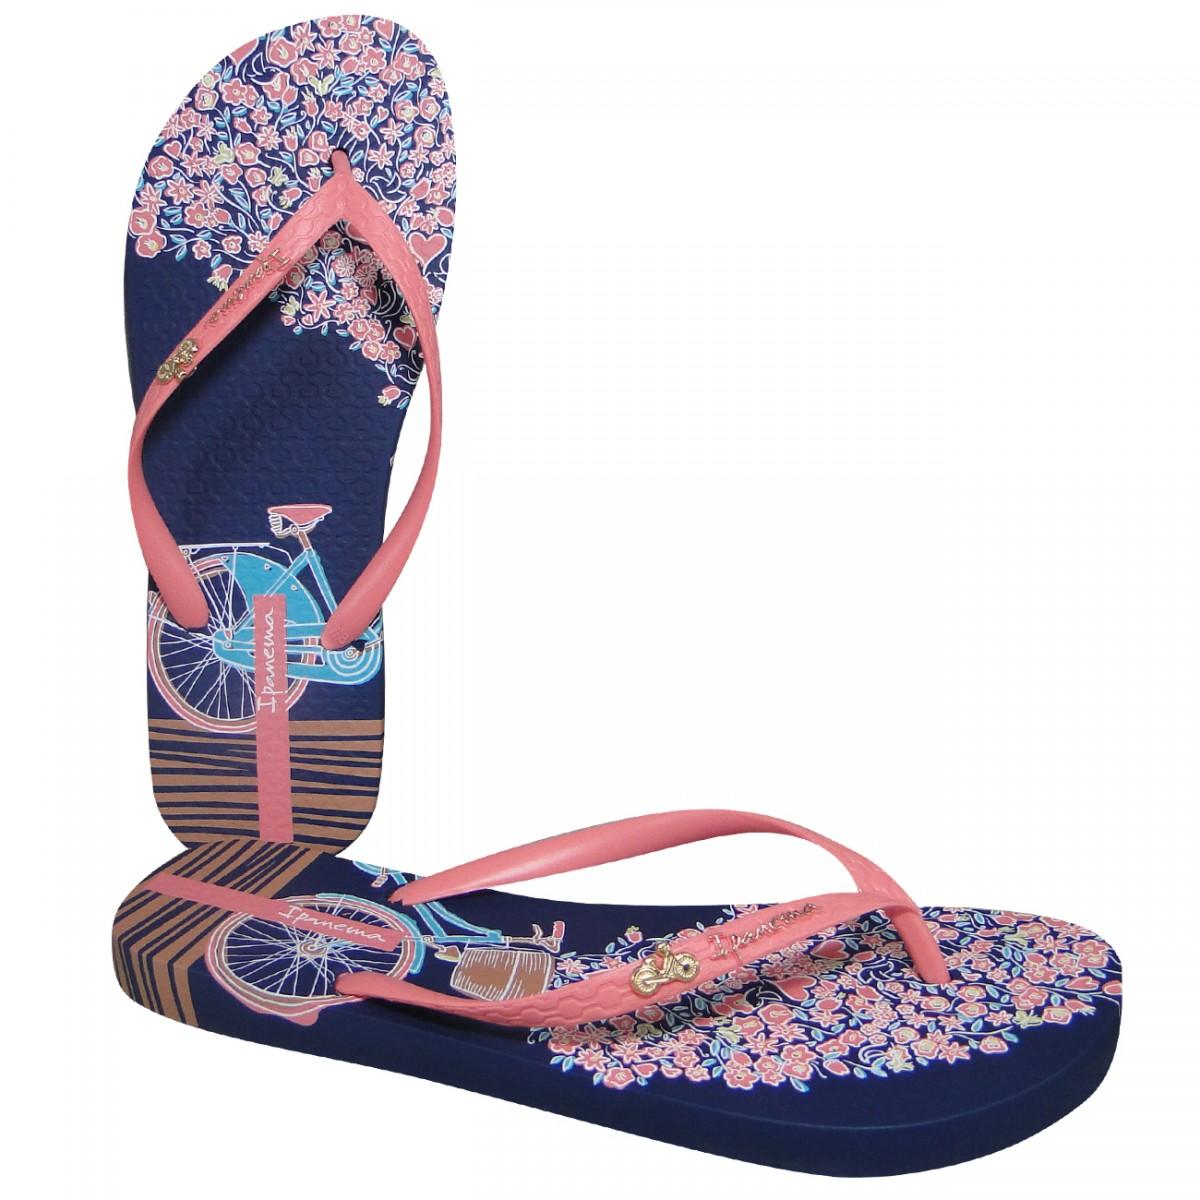 2a9fb069688 Chinelo Ipanema 25601 Mari 25601 20502 - Azul/Rosa - Chuteira Nike, Adidas.  Sandalias Femininas. Sandy Calçados